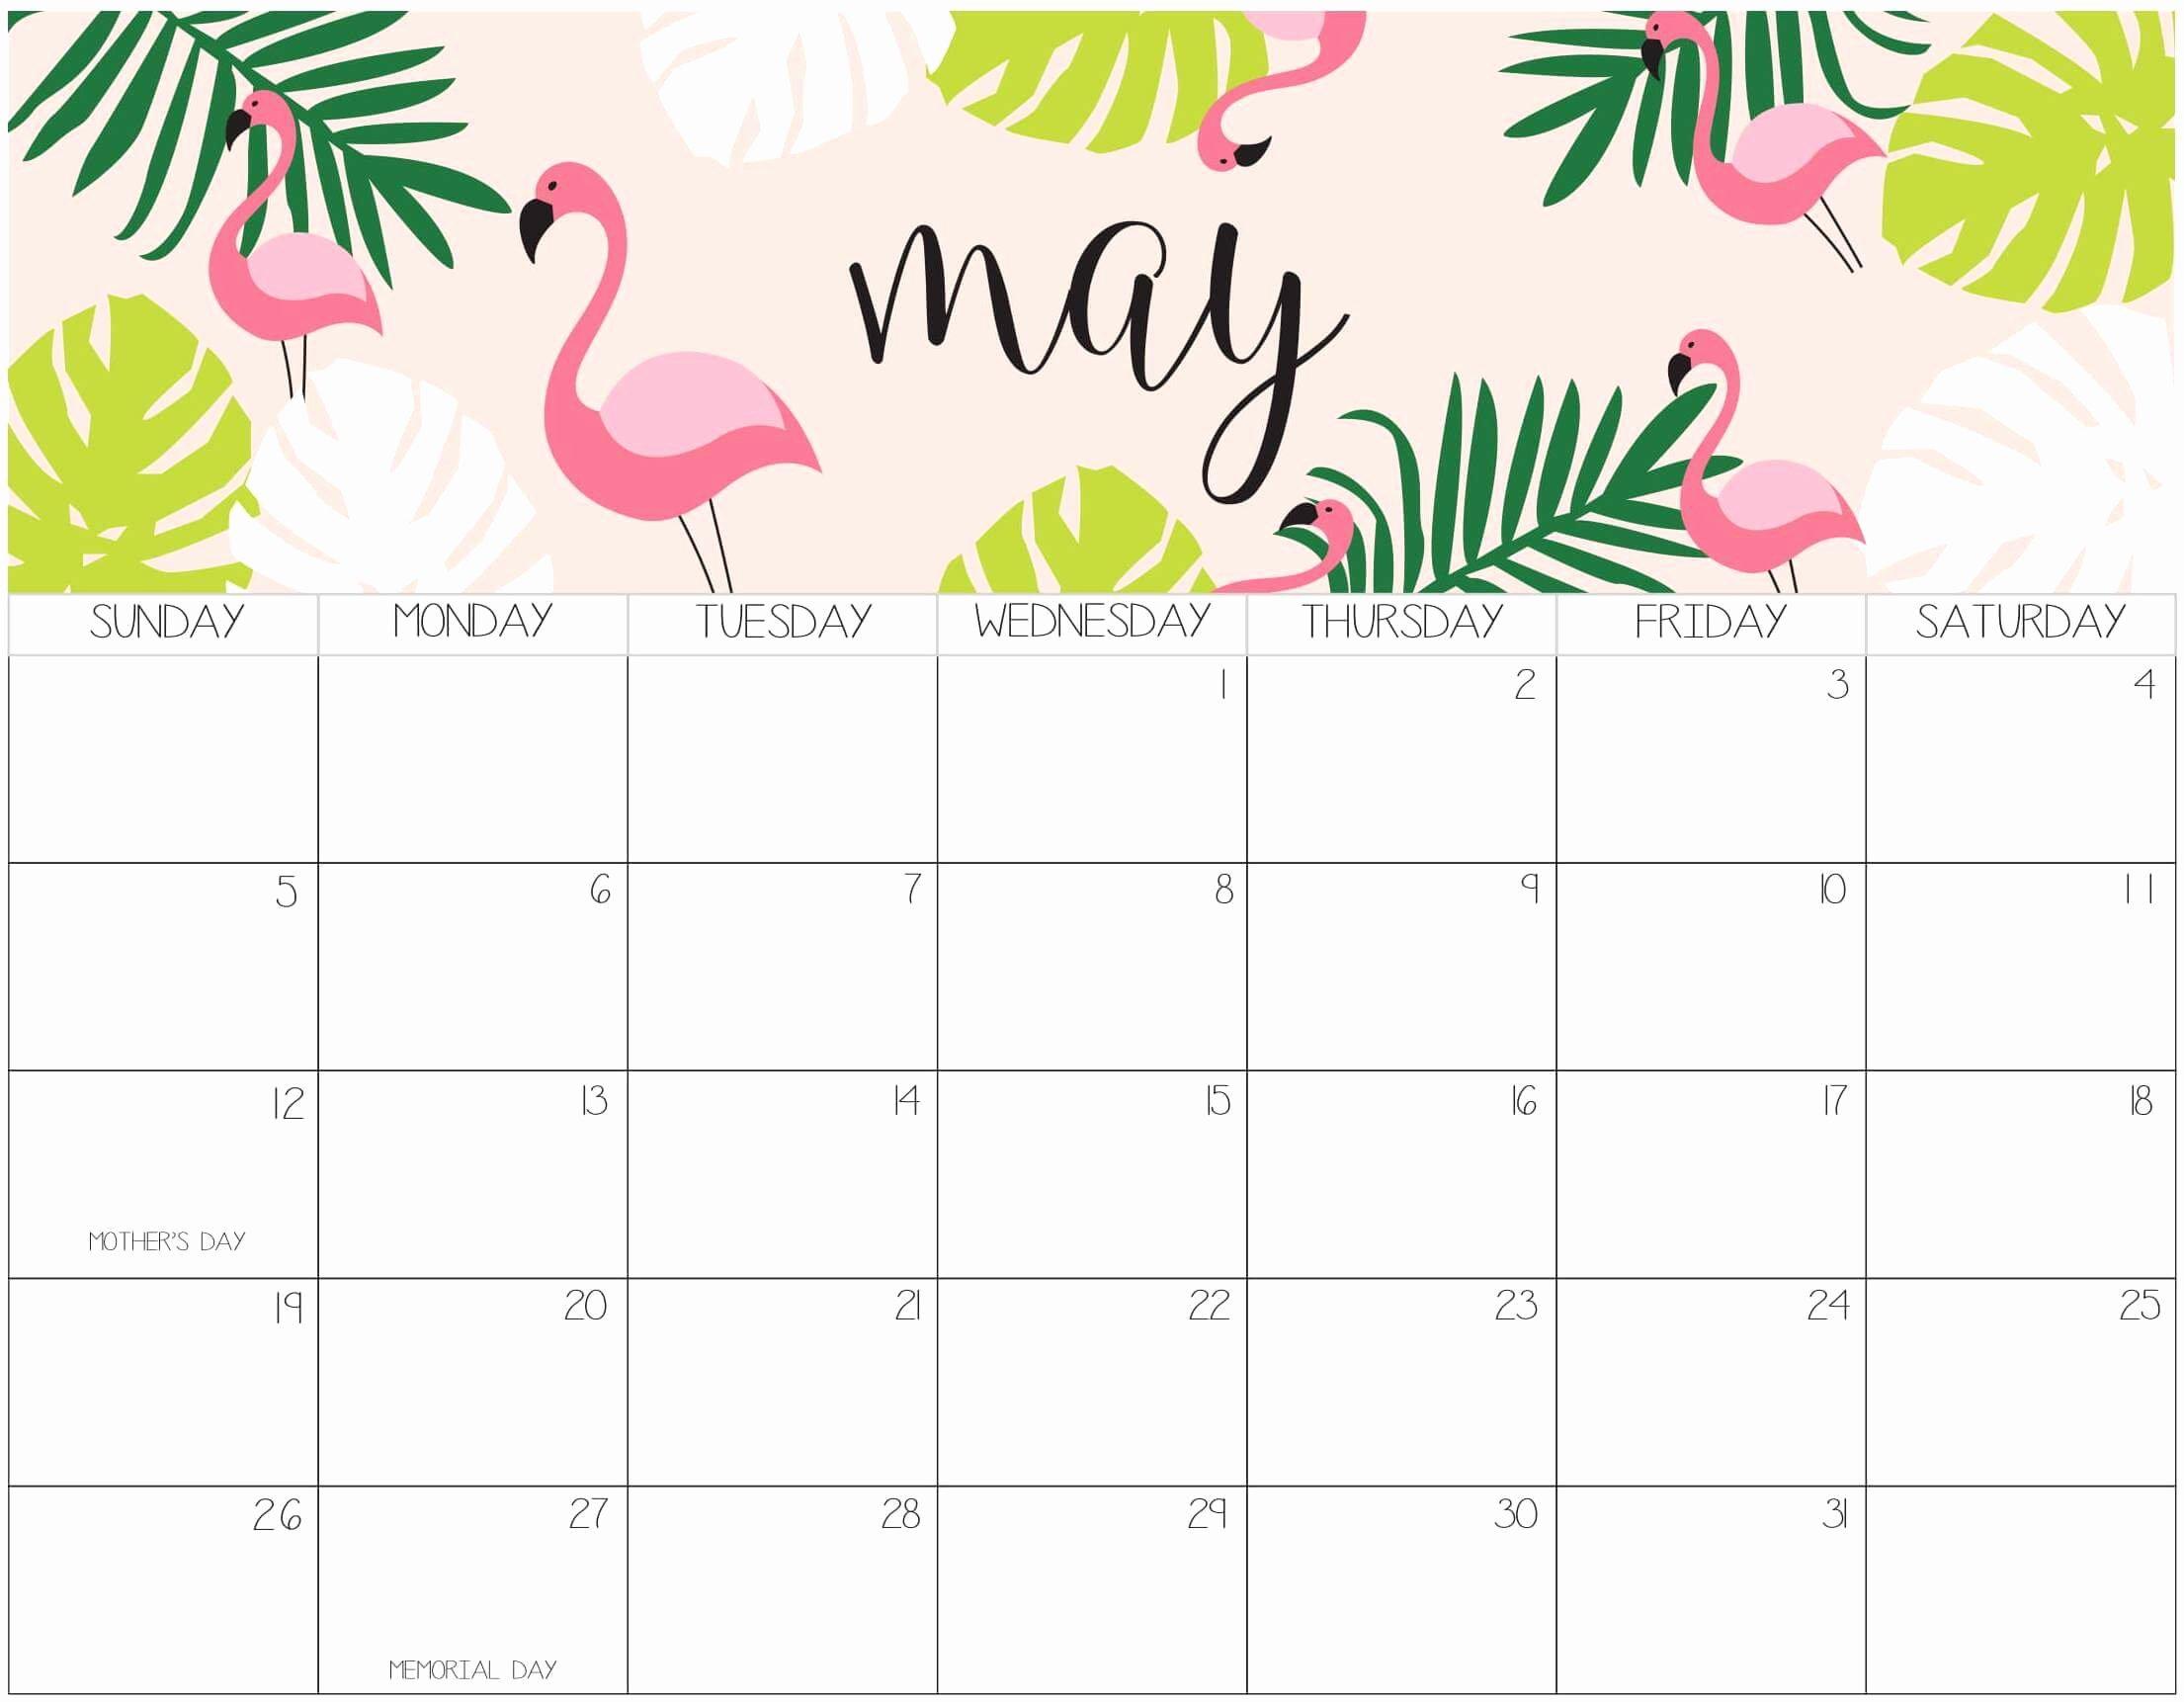 Cute Calendar Template 2019 Inspirational Cute May 2019 Calendar Printable for Kids